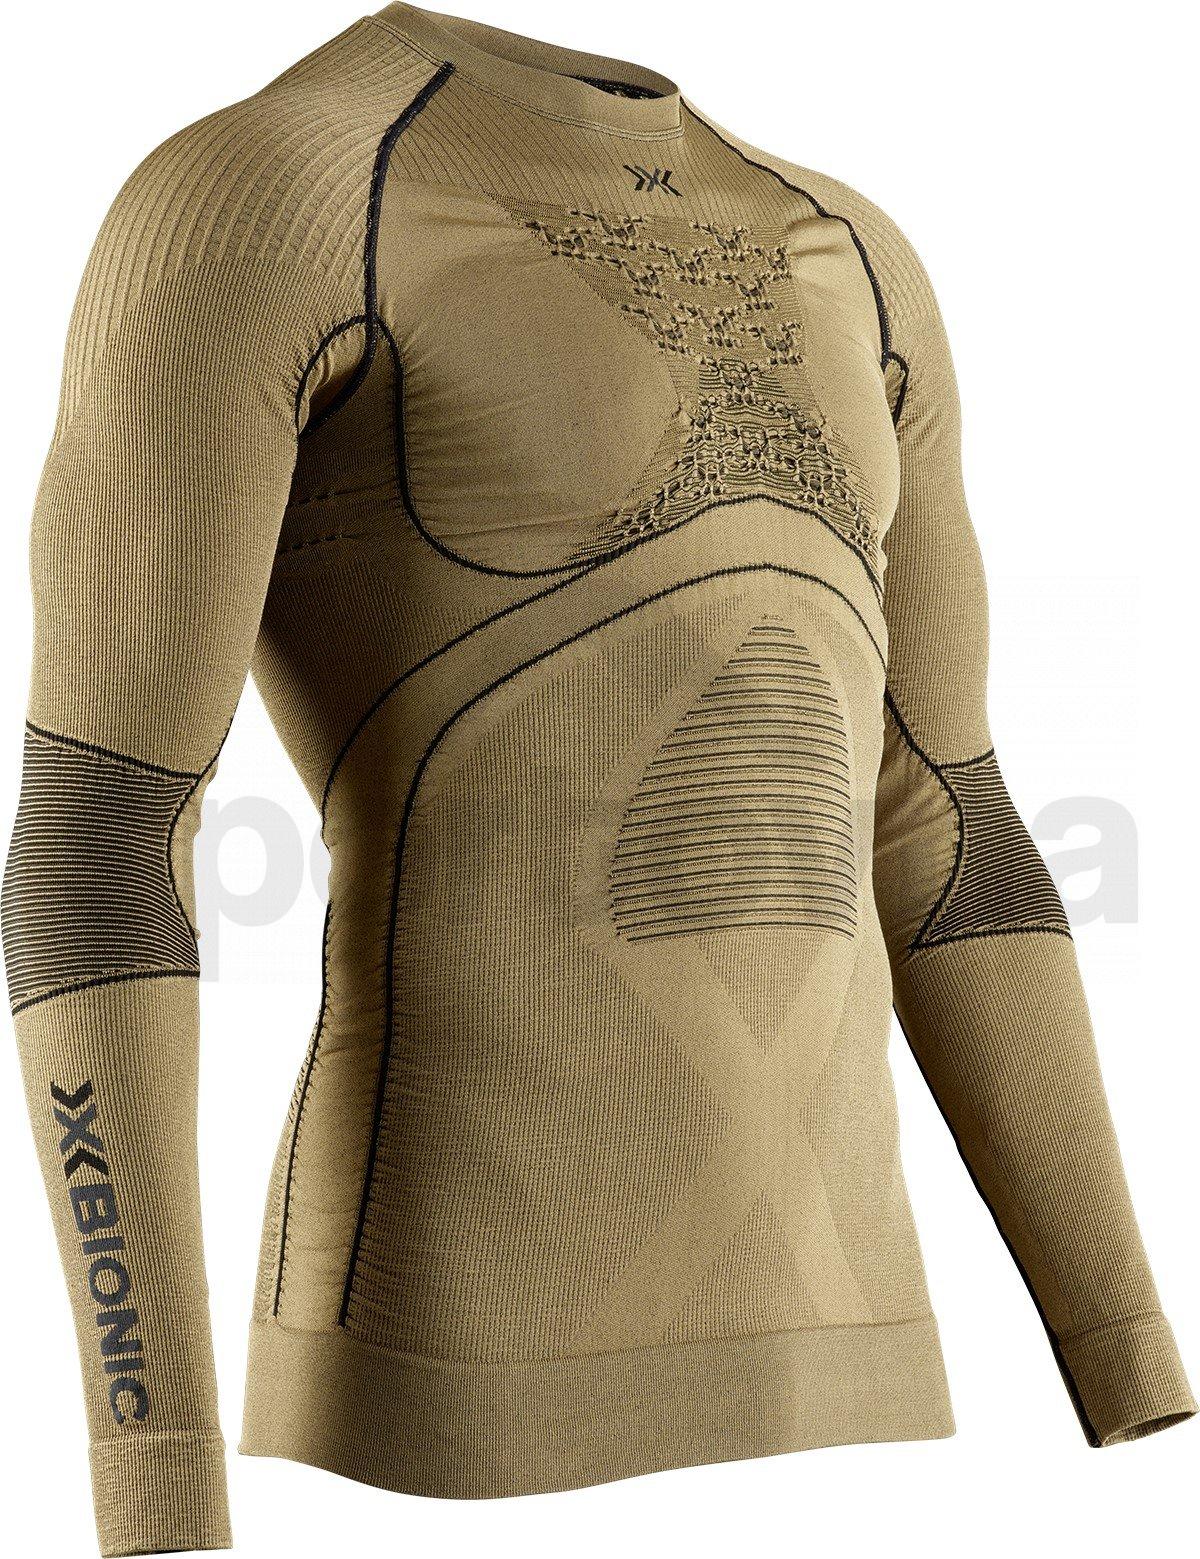 x-bionic-radiactor-4-0-shirt-round-neck-lg-sl-m